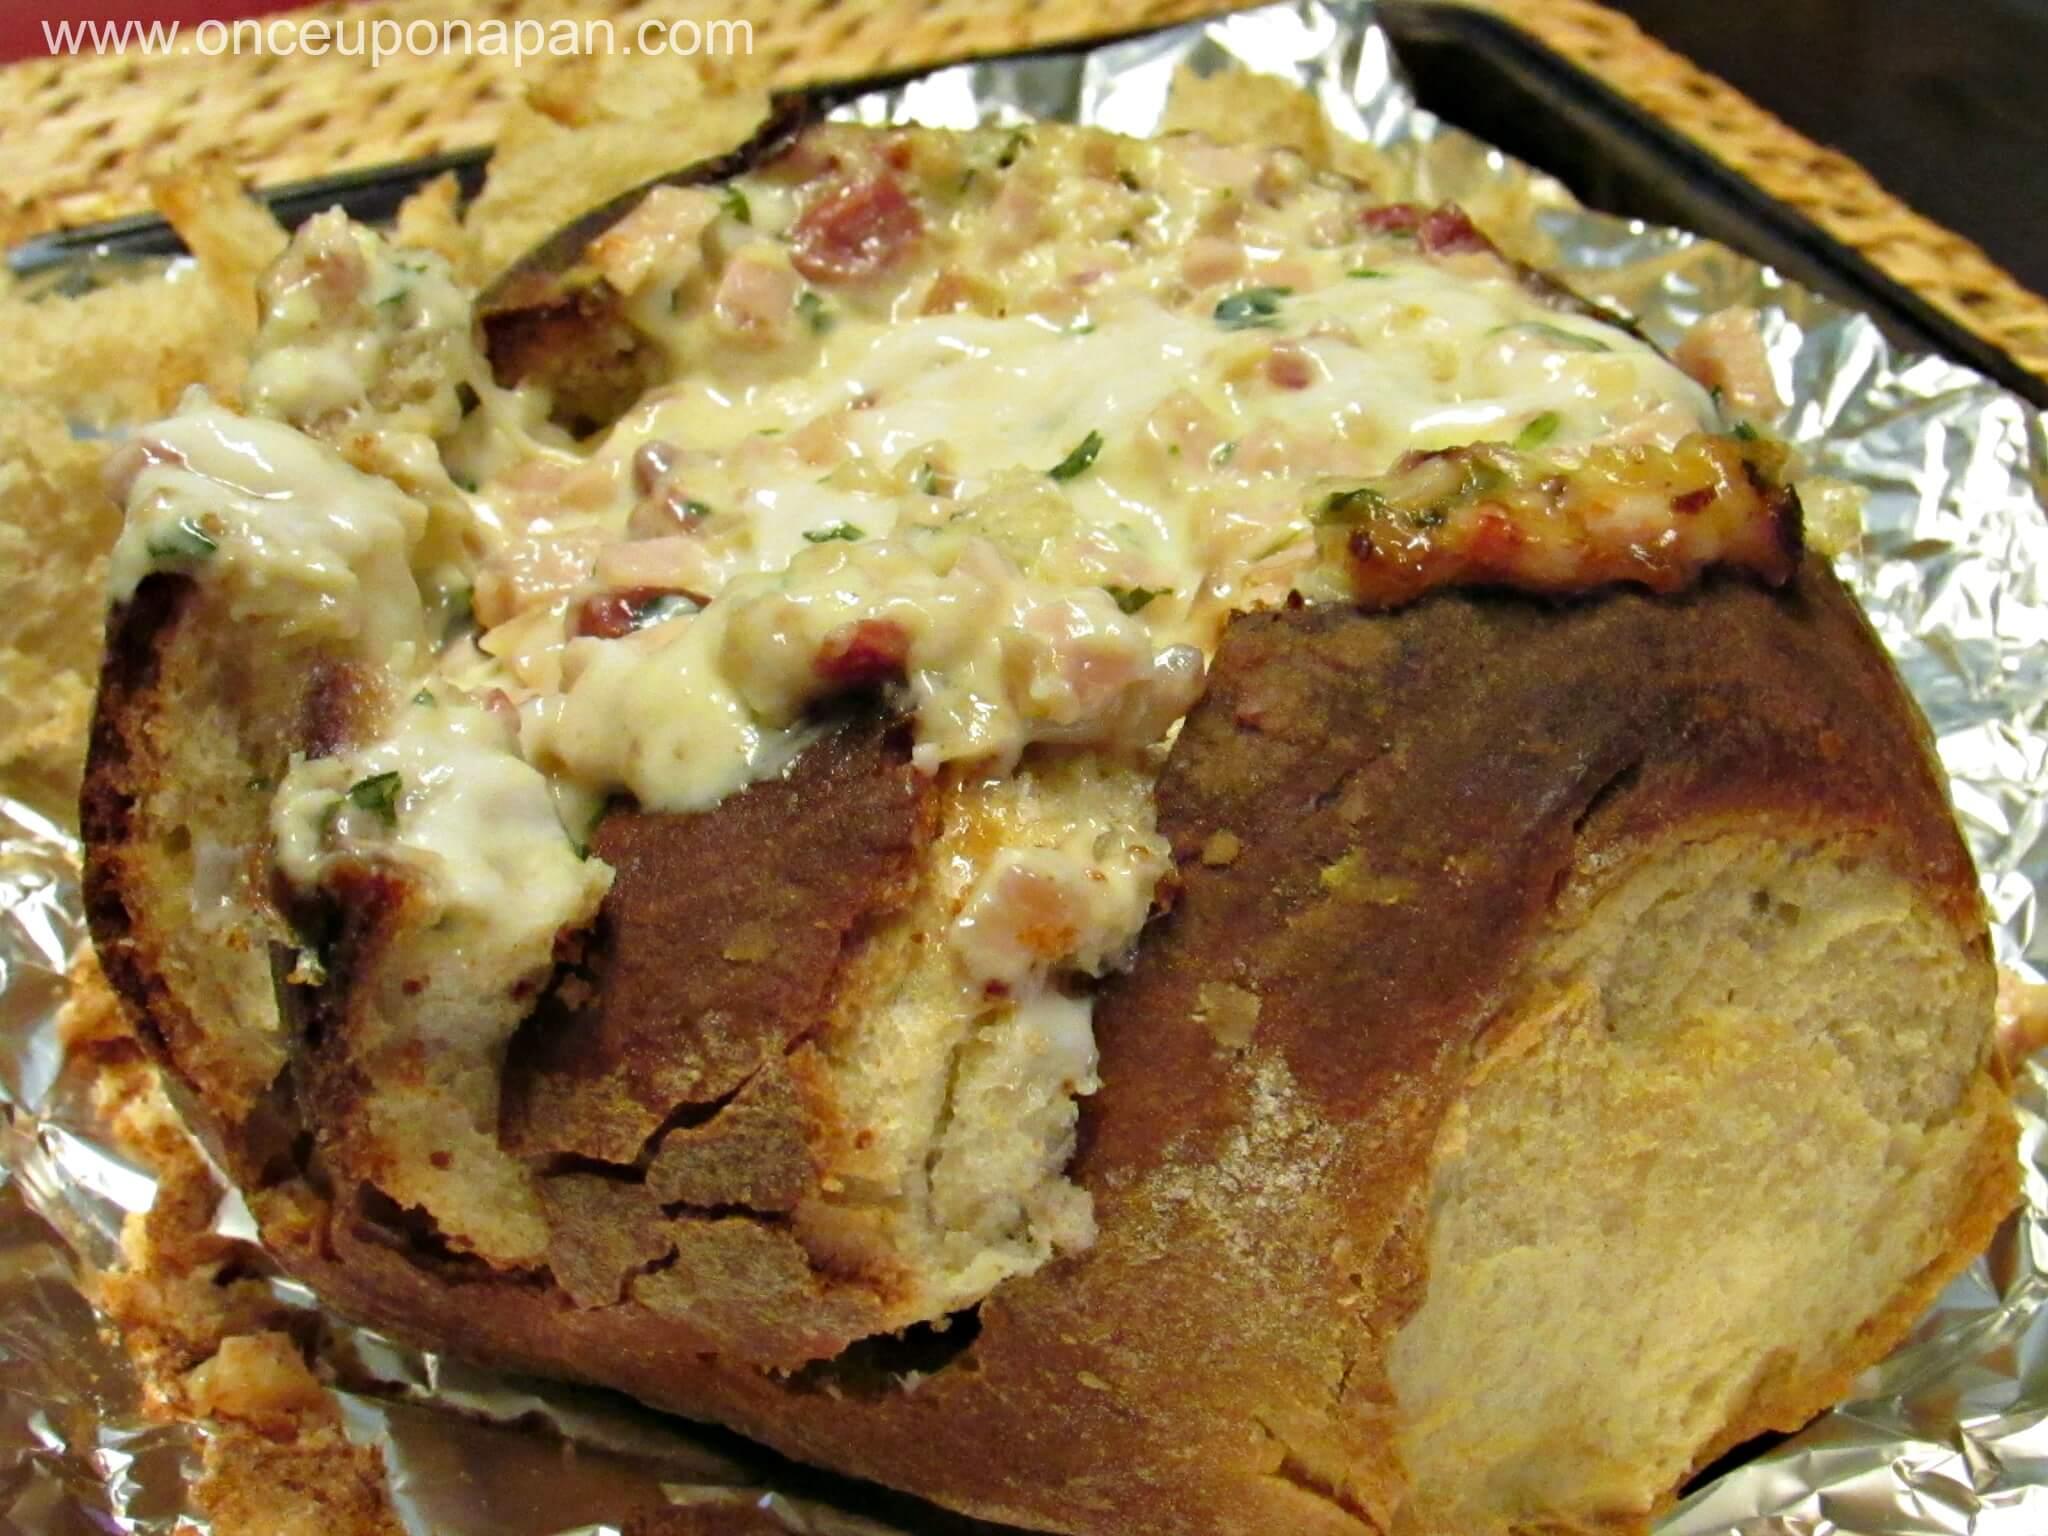 Bread stuffed with ham and mushrooms